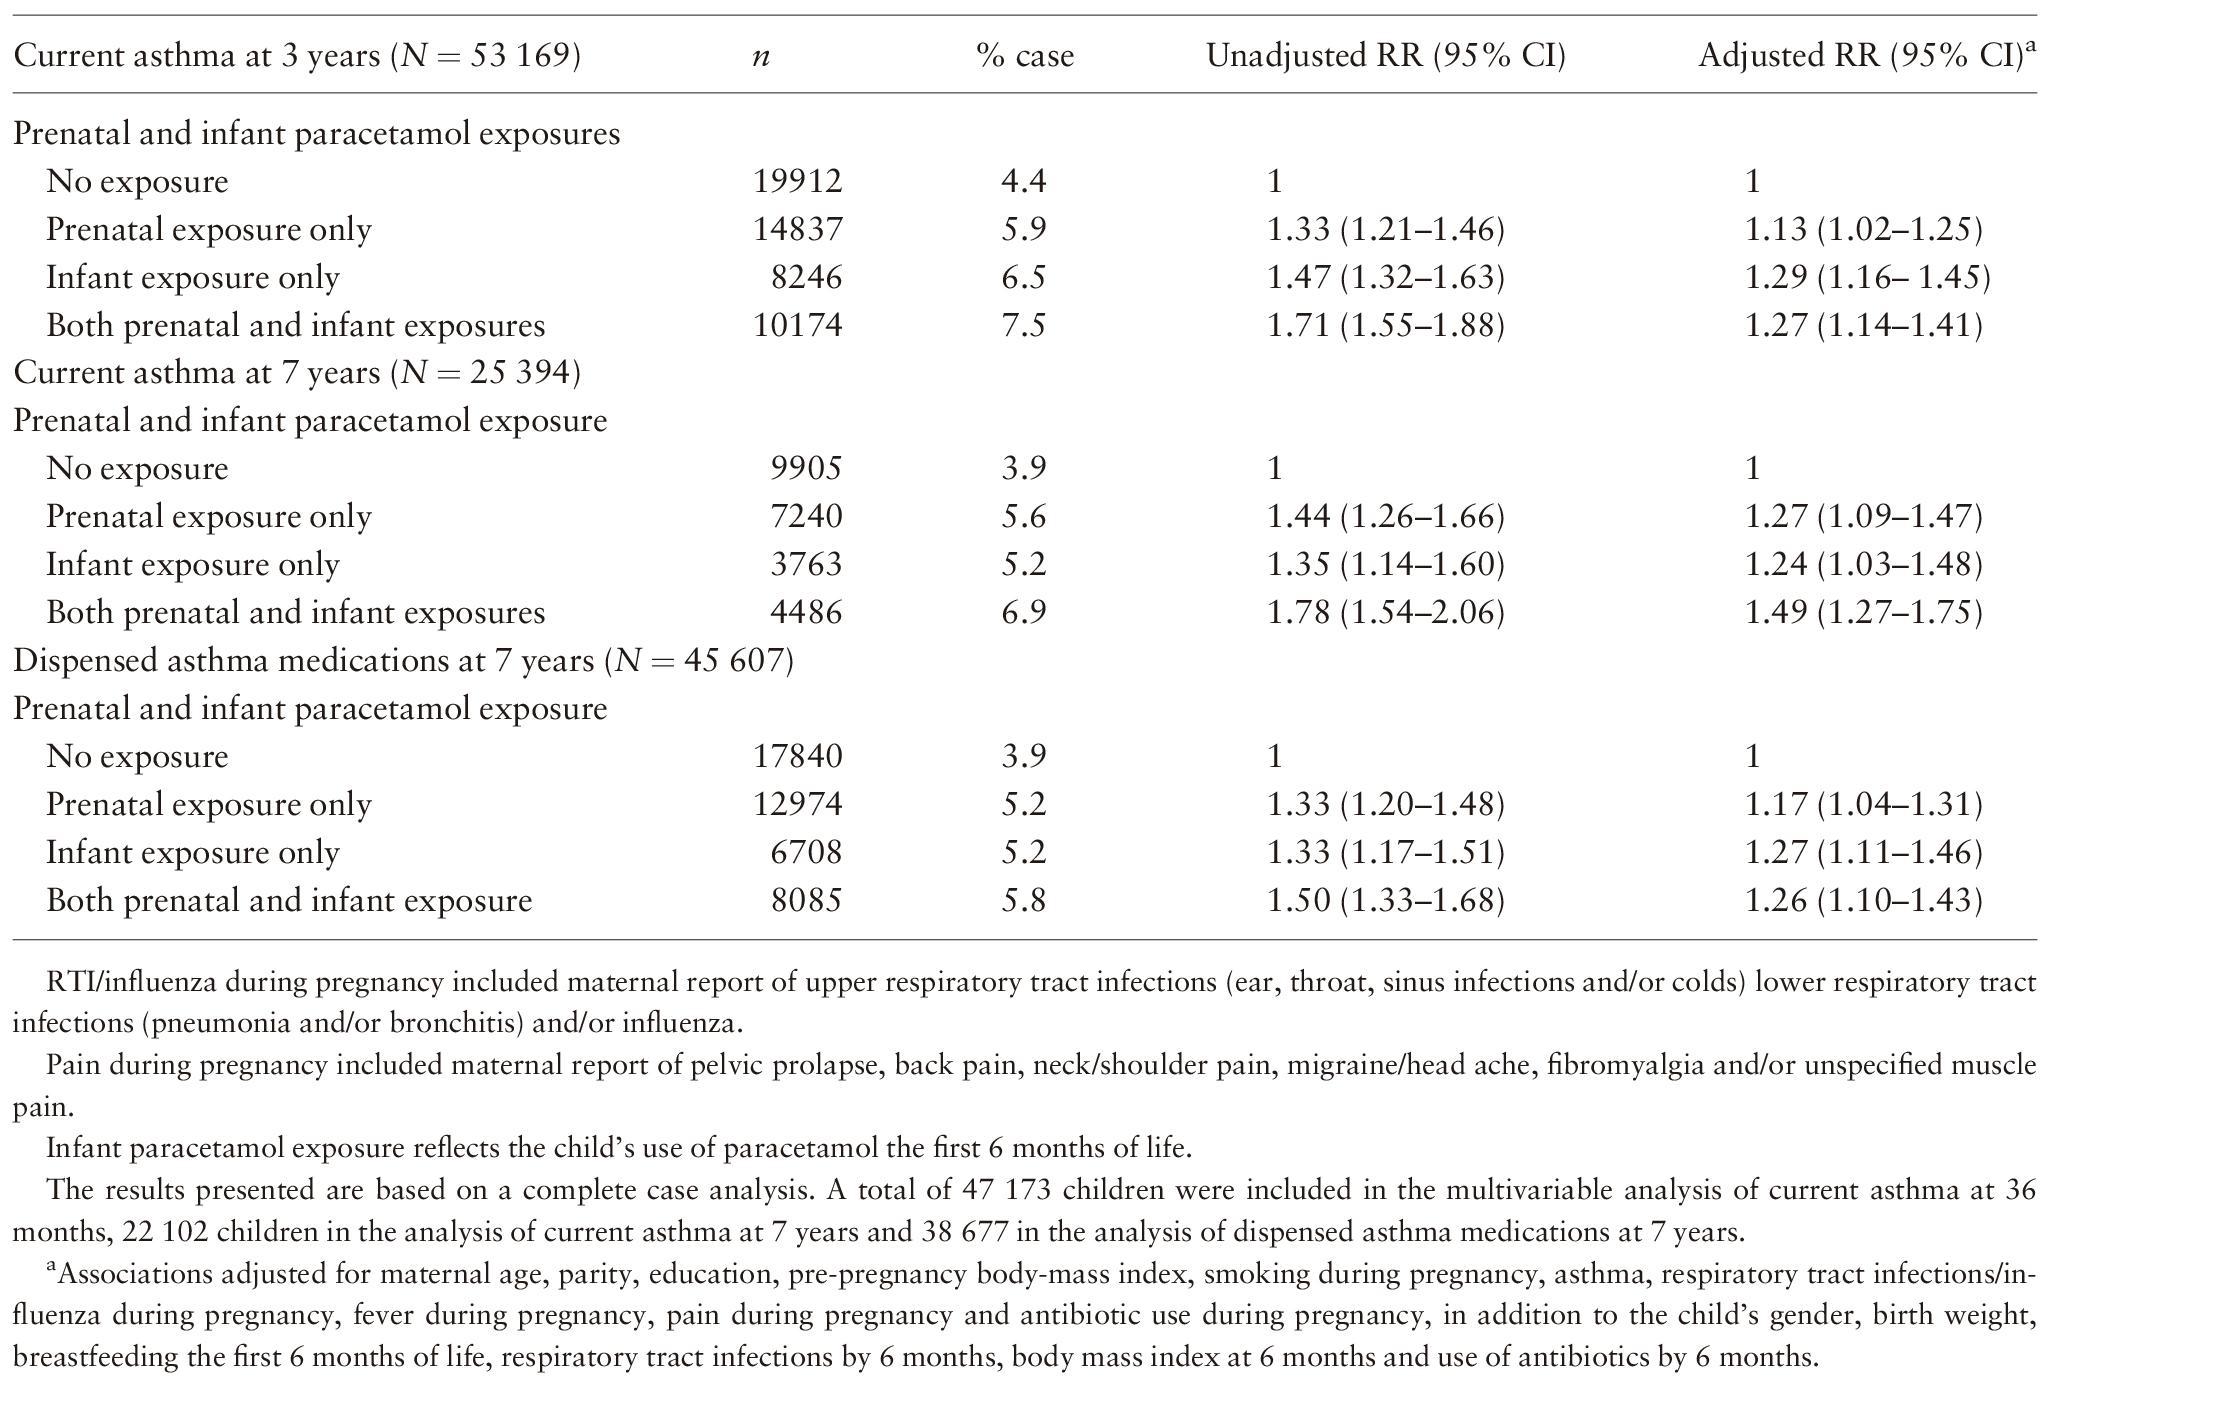 Prenatal and infant paracetamol exposure and development of asth